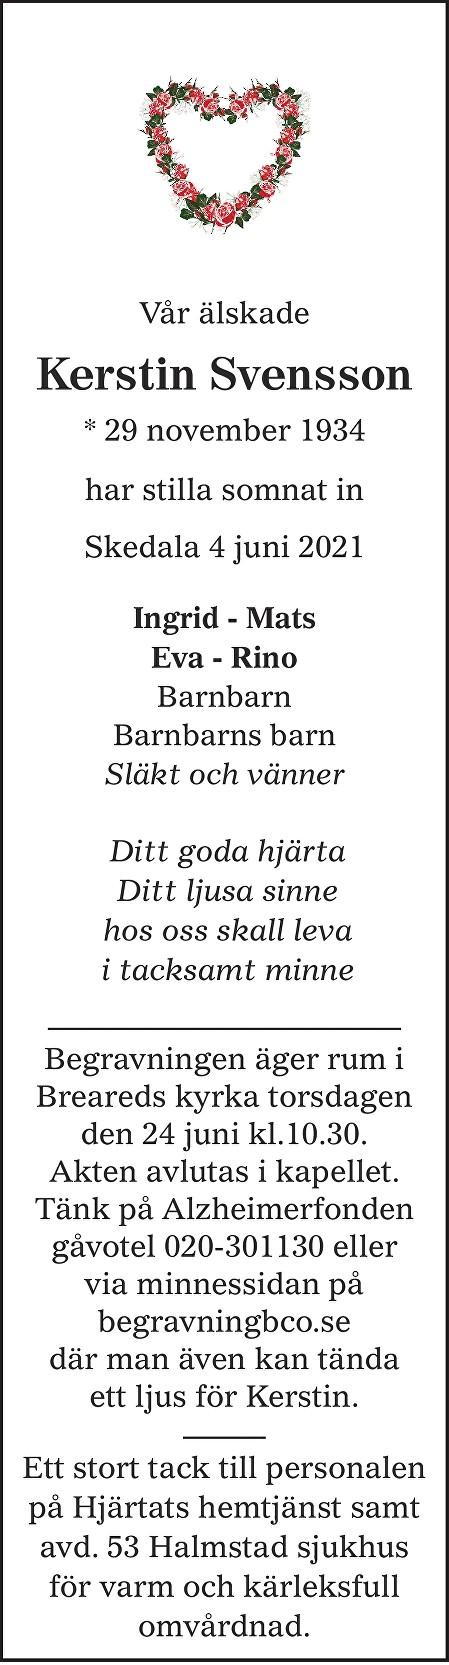 Kerstin Svensson Death notice